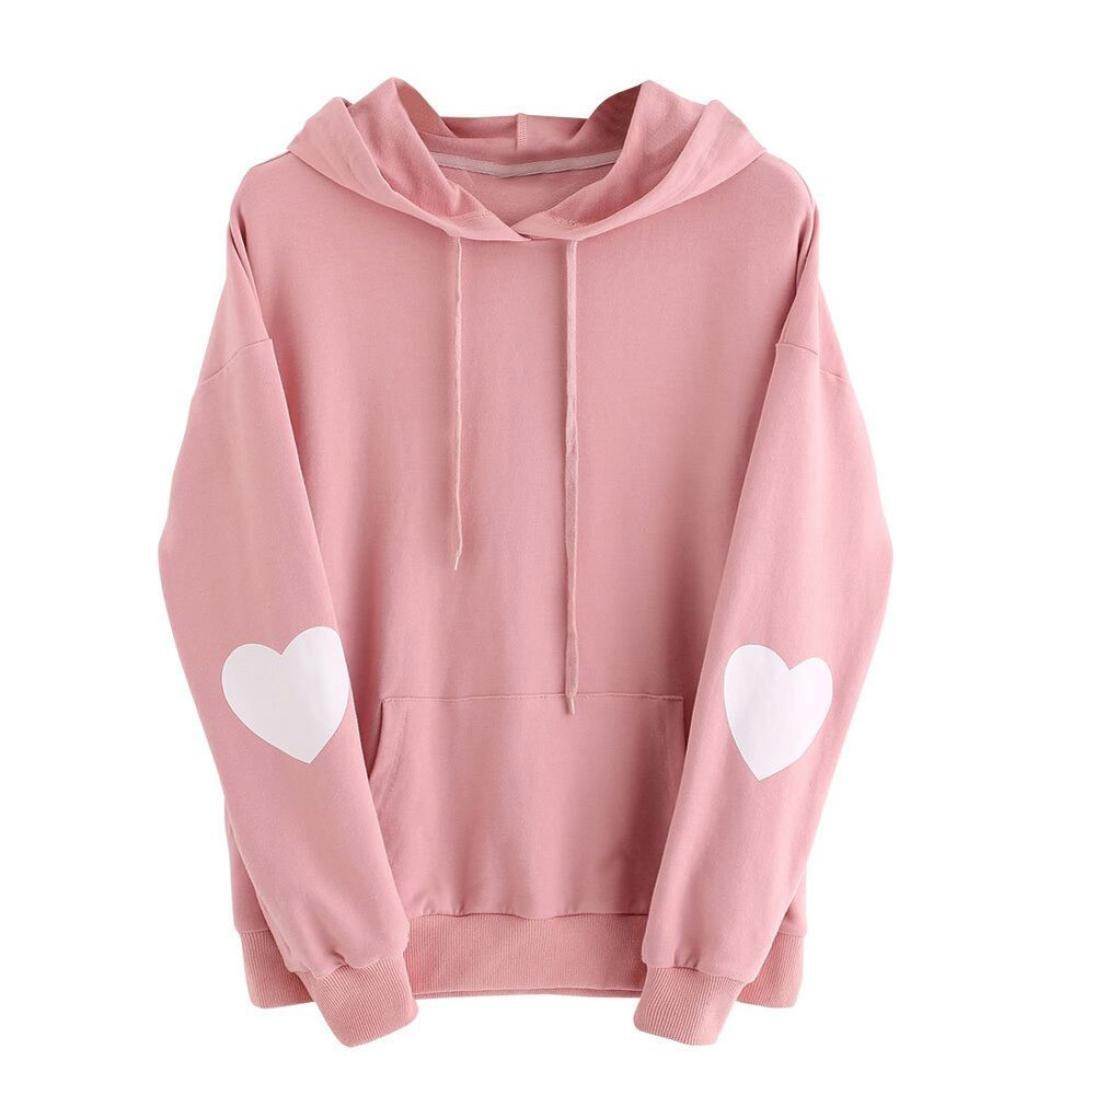 KaiCran Fashion Sweatshirt Womens Long Sleeve Heart Hoodie Sweatshirt Jumper Hooded Pullover Tops Blouse (XXXLarge, Pink)